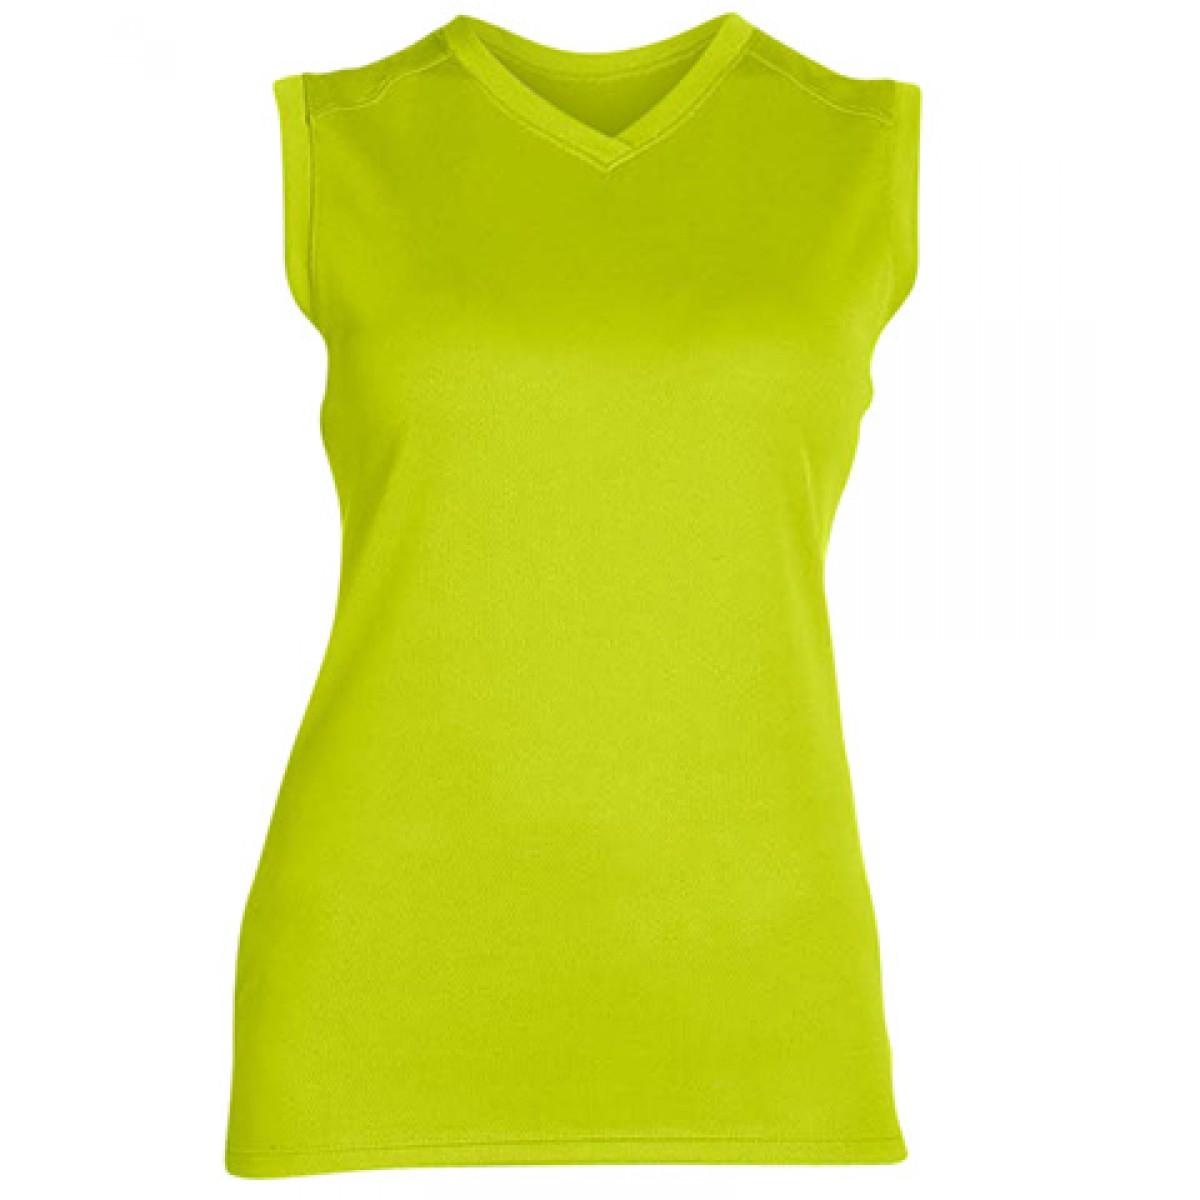 Ladies' Athletic V-Neck Workout T-Shirt